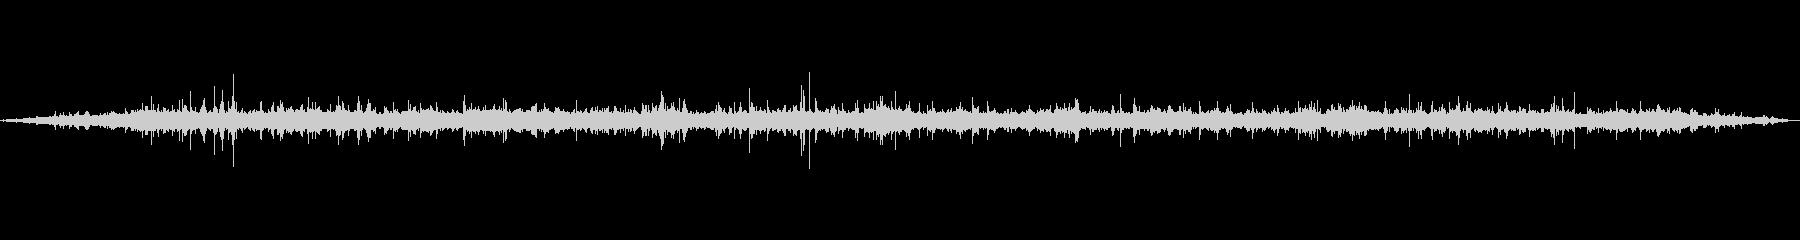 [ASMR]波打ち際の音_010の未再生の波形